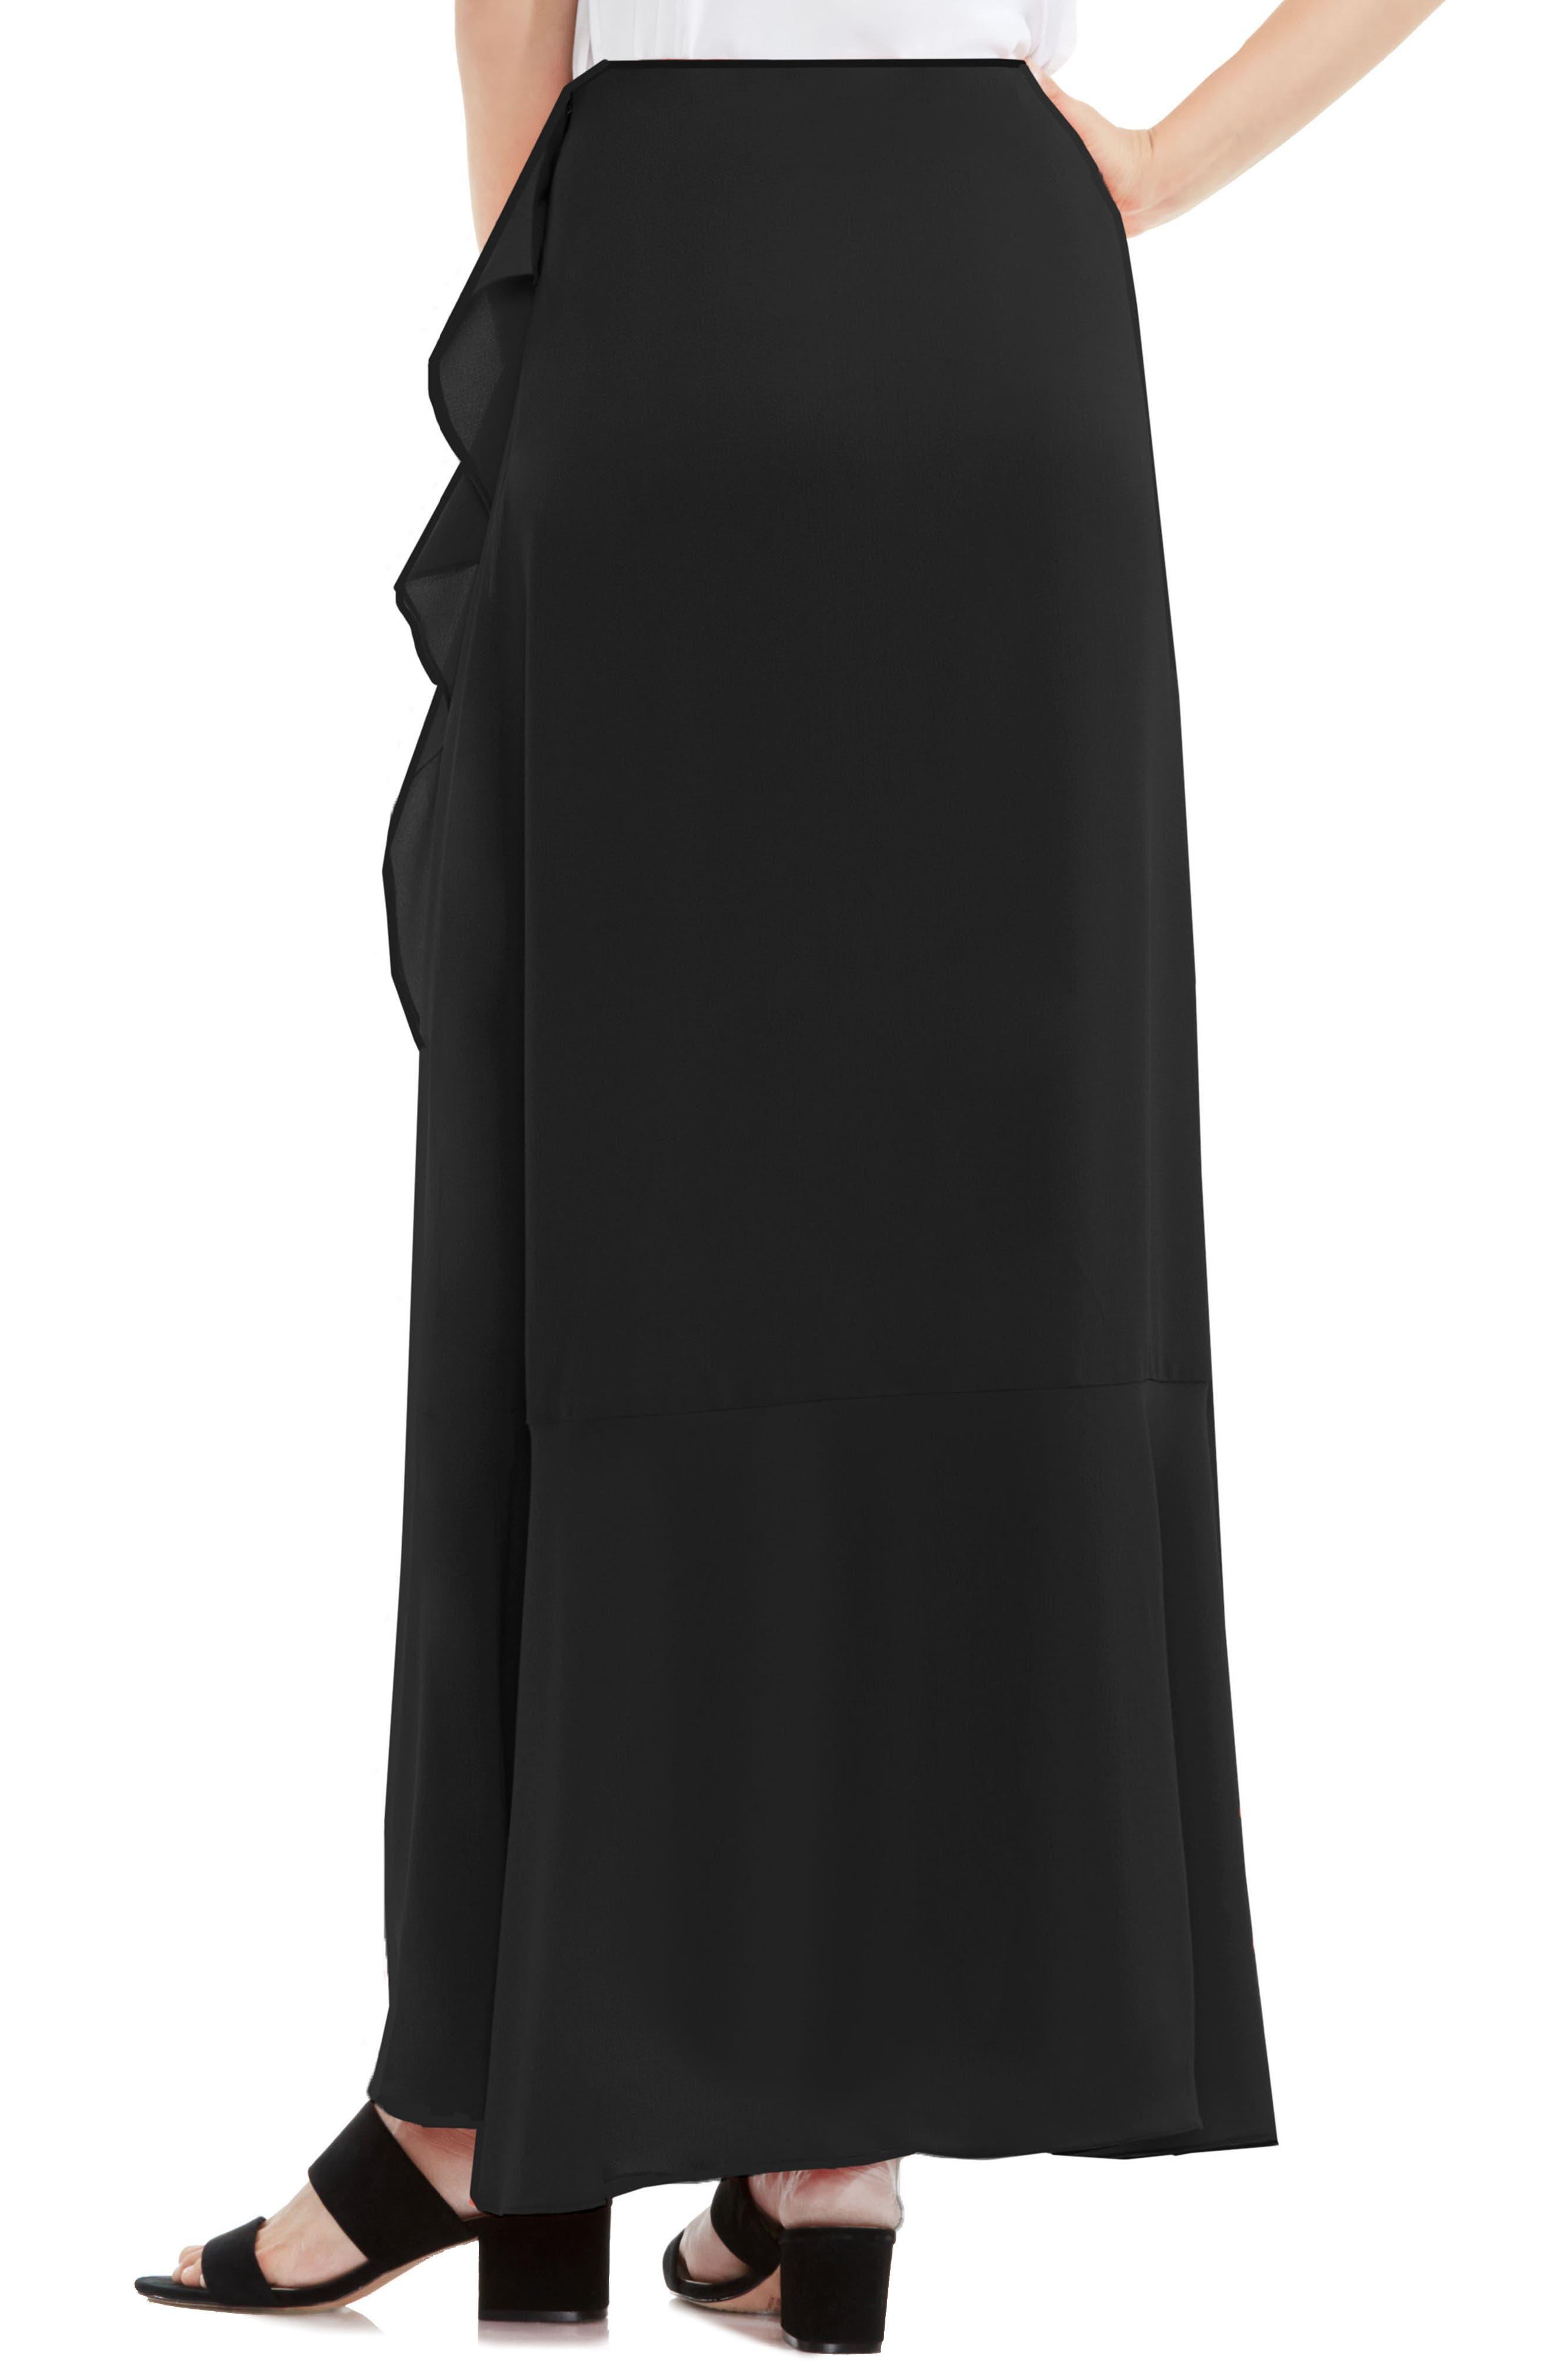 VINCE CAMUTO,                             Faux Wrap Ruffled Maxi Skirt,                             Alternate thumbnail 2, color,                             006